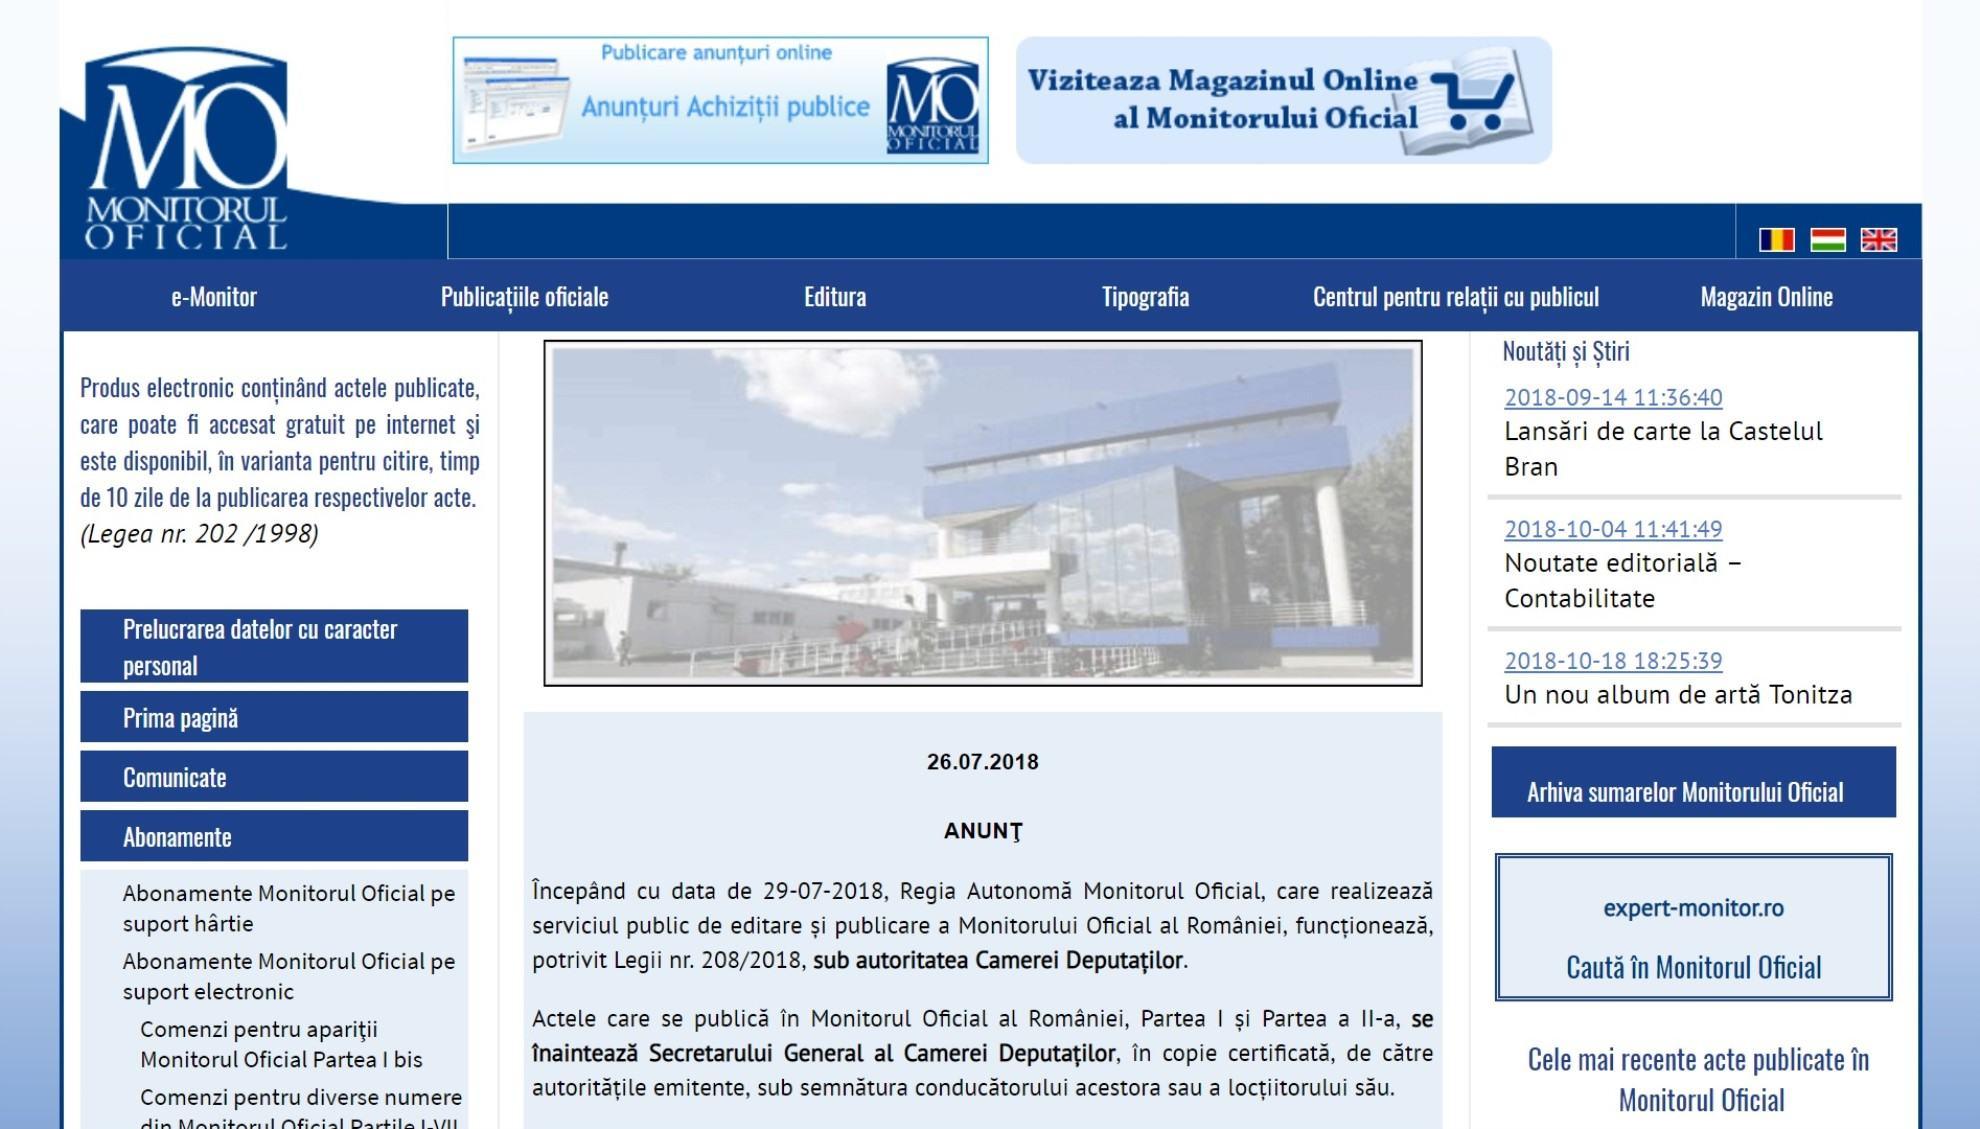 Monitorul Oficial - MonitorulOficial.ro